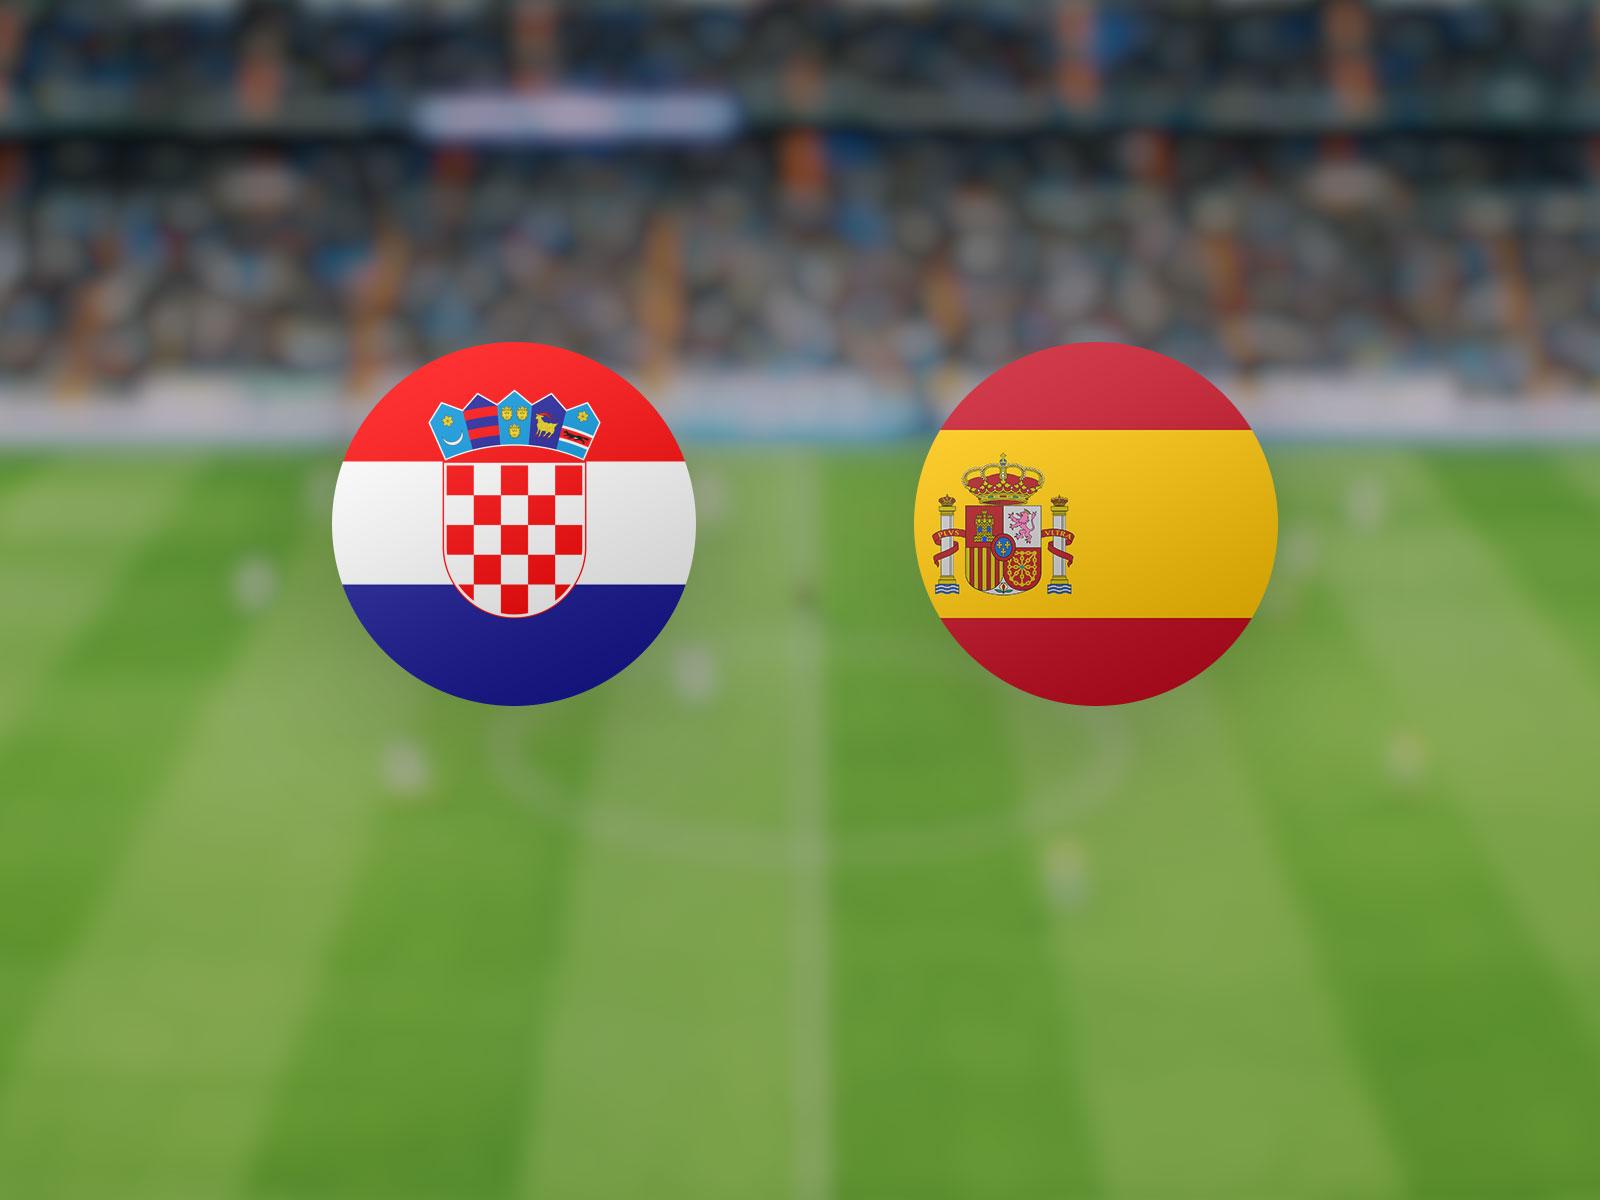 watch Croatia vs Spain in Euro 2020 last-16 knockout rounds